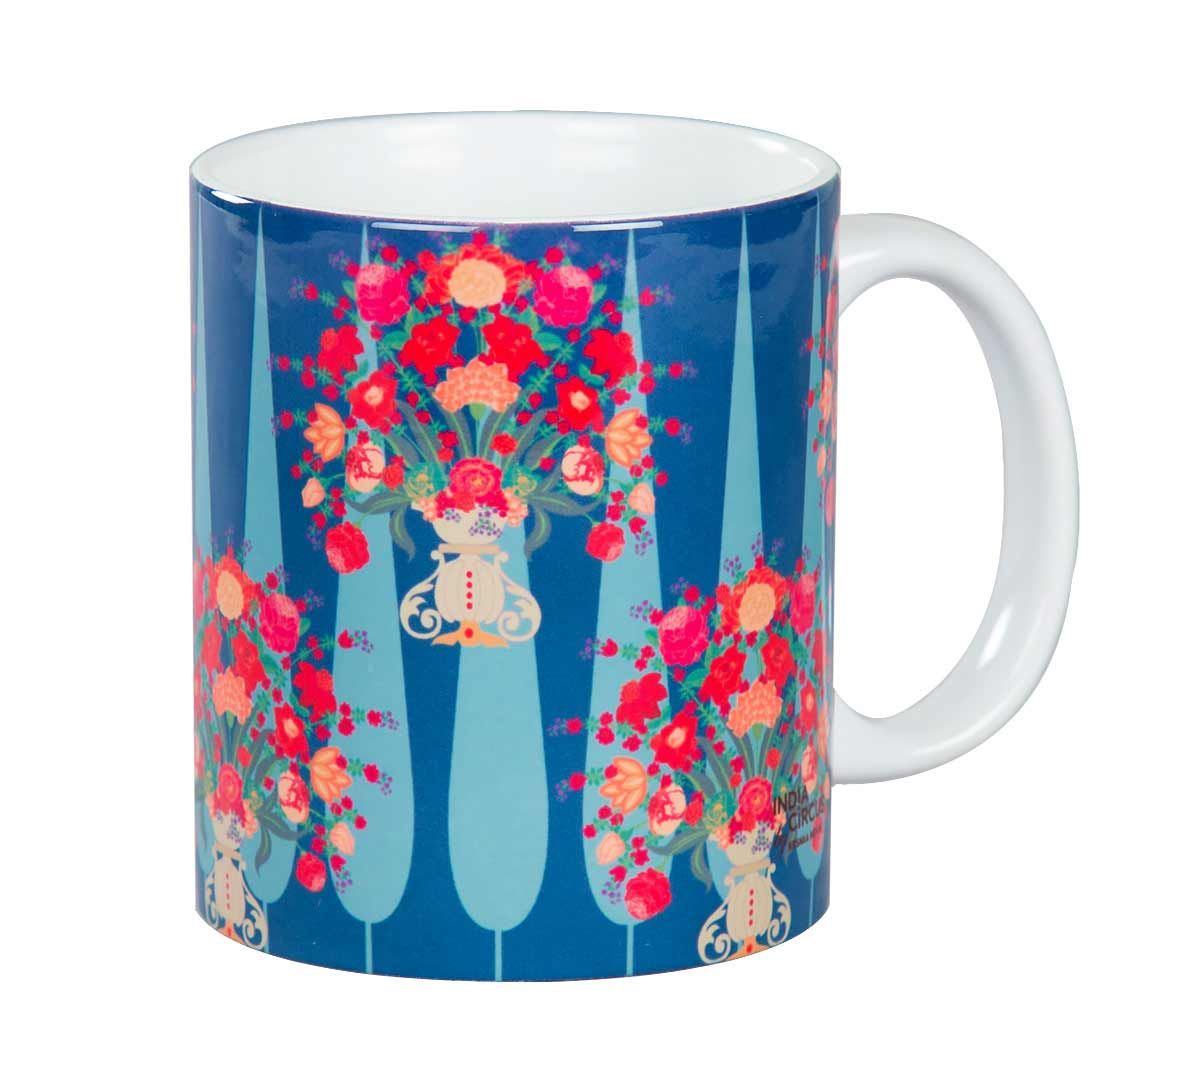 Conifer Affair Mug